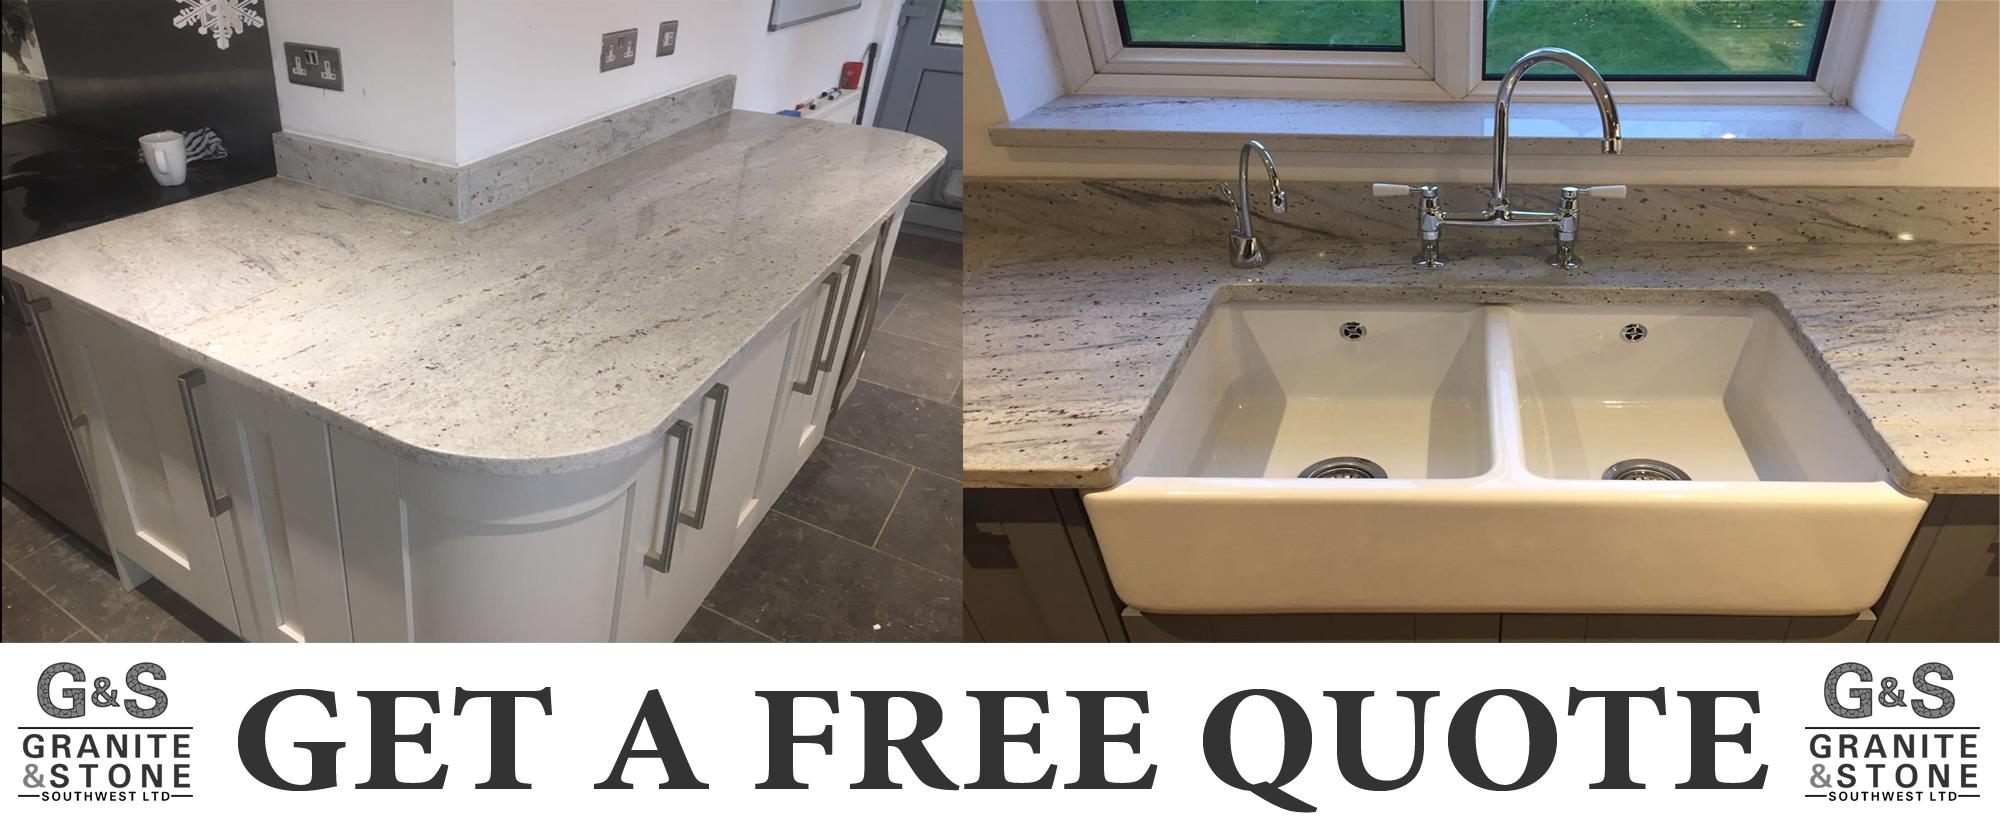 Granite worktop quote